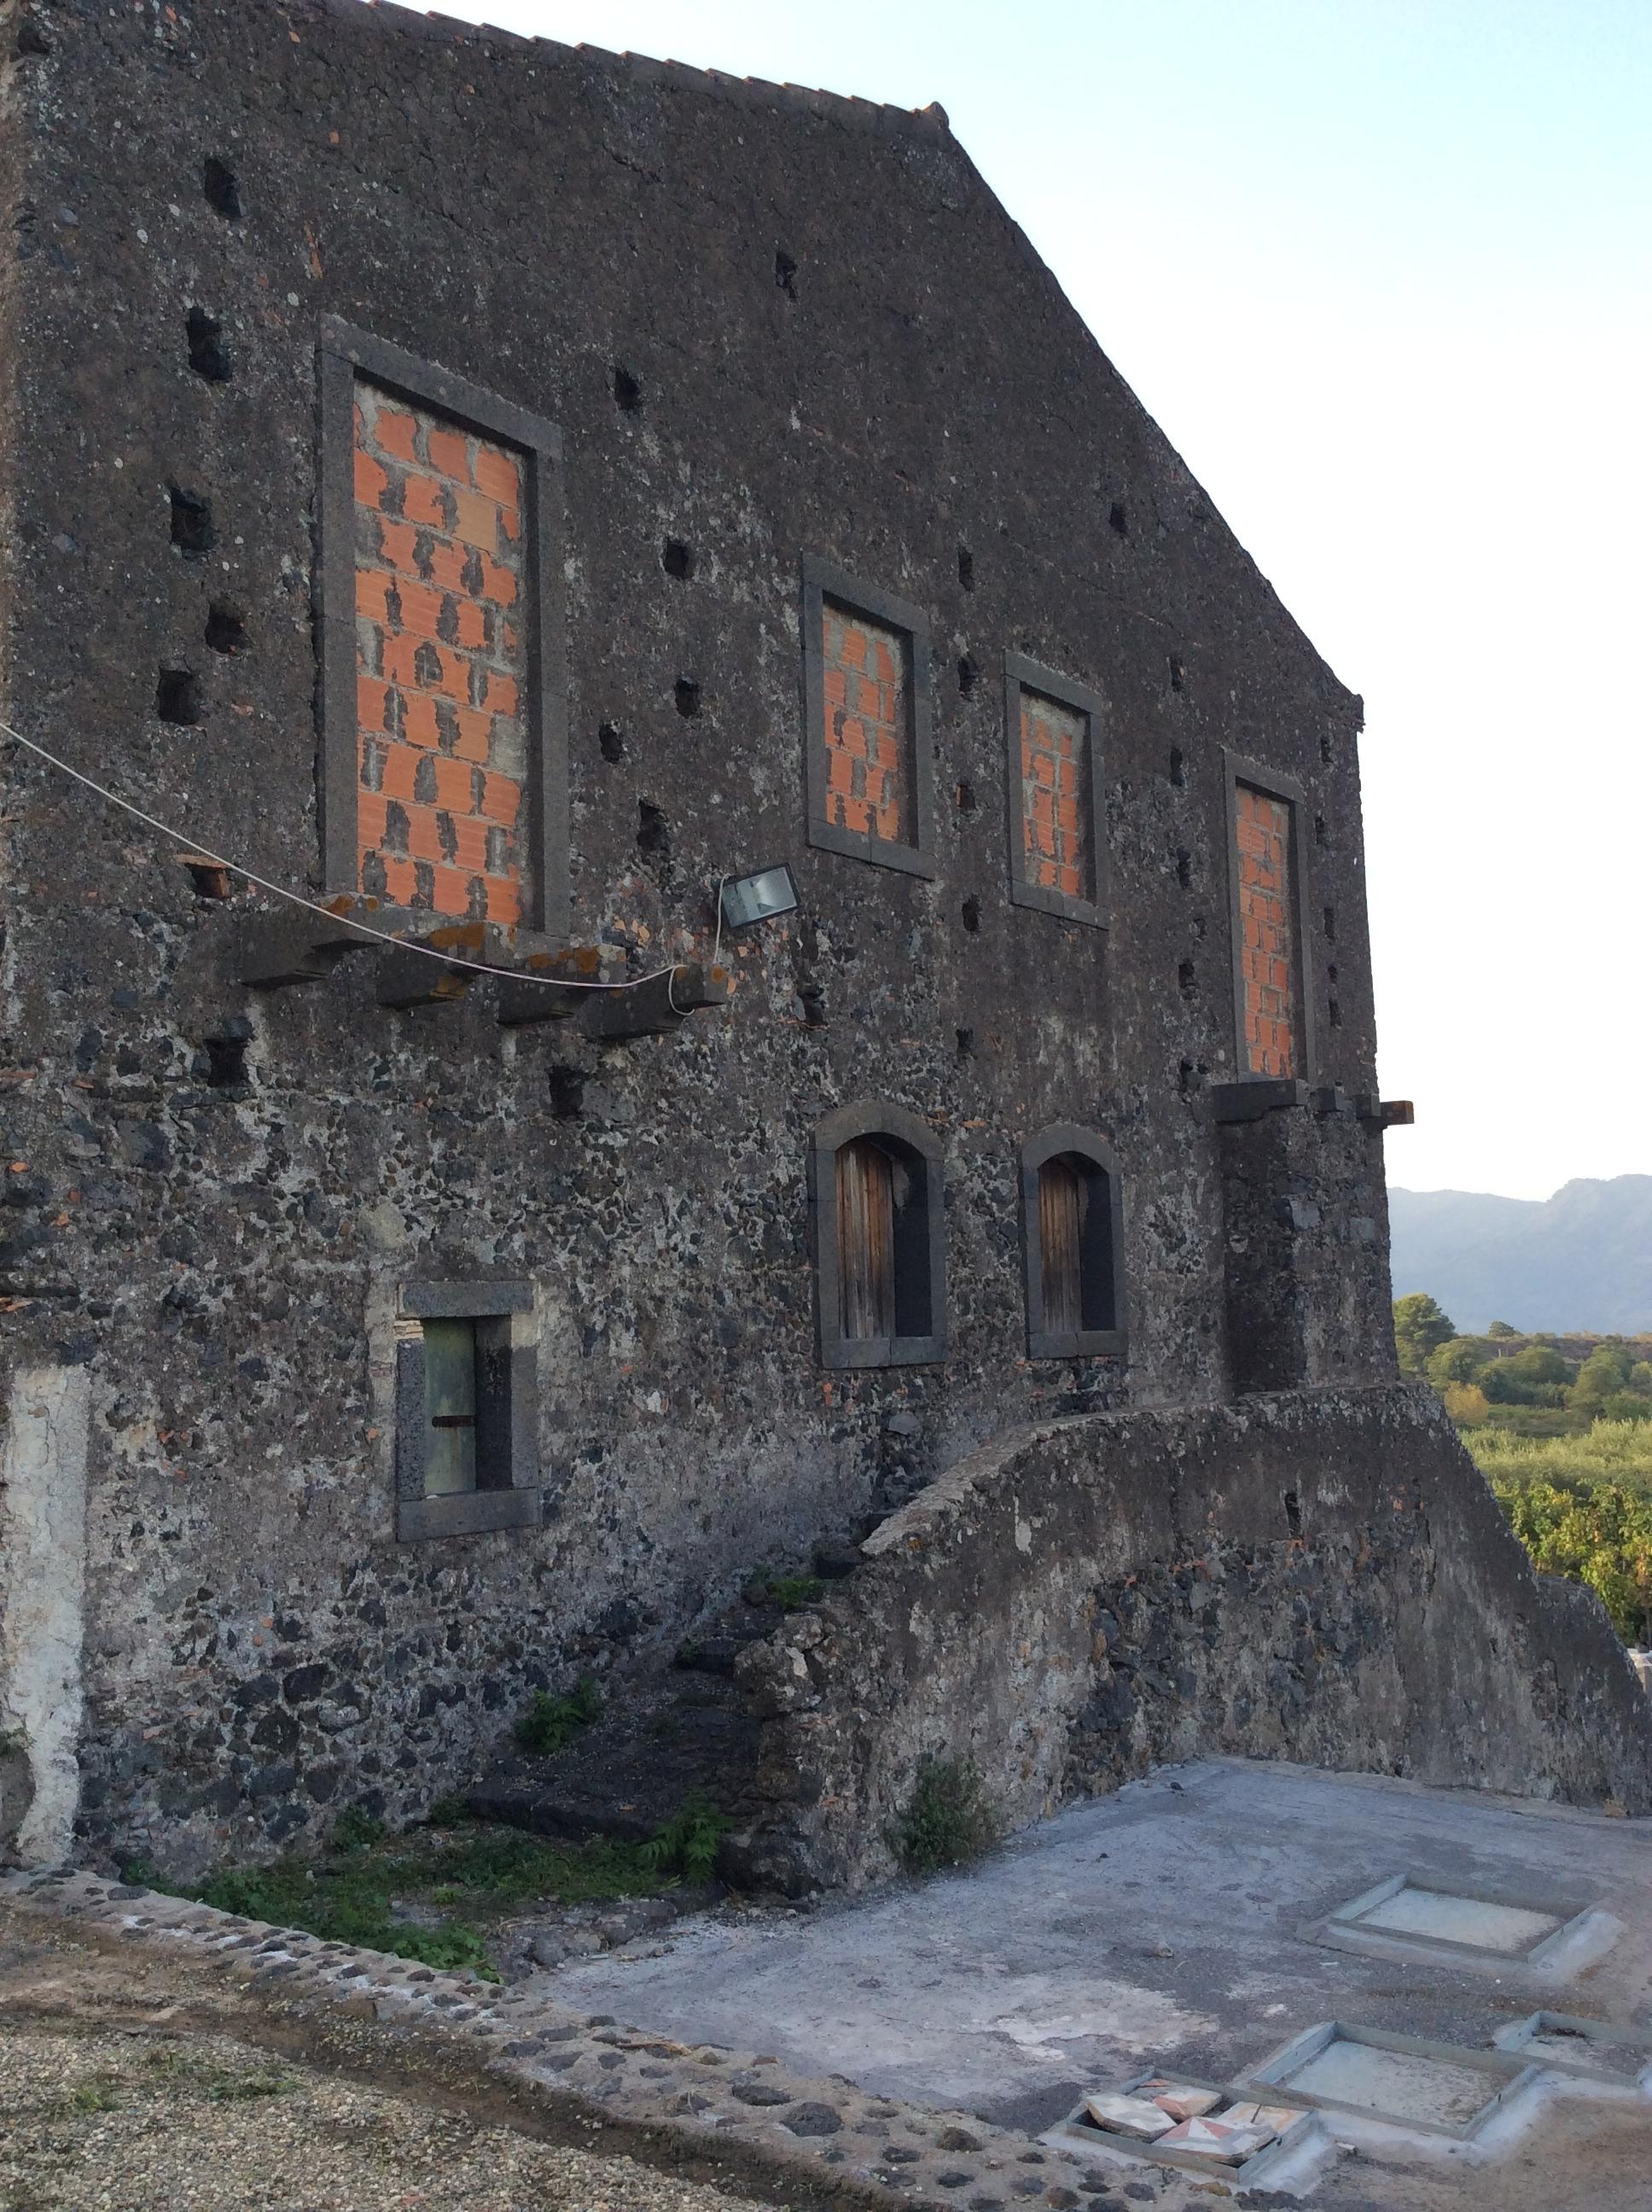 Vineri-i-Palmento-Etna-1700-tal